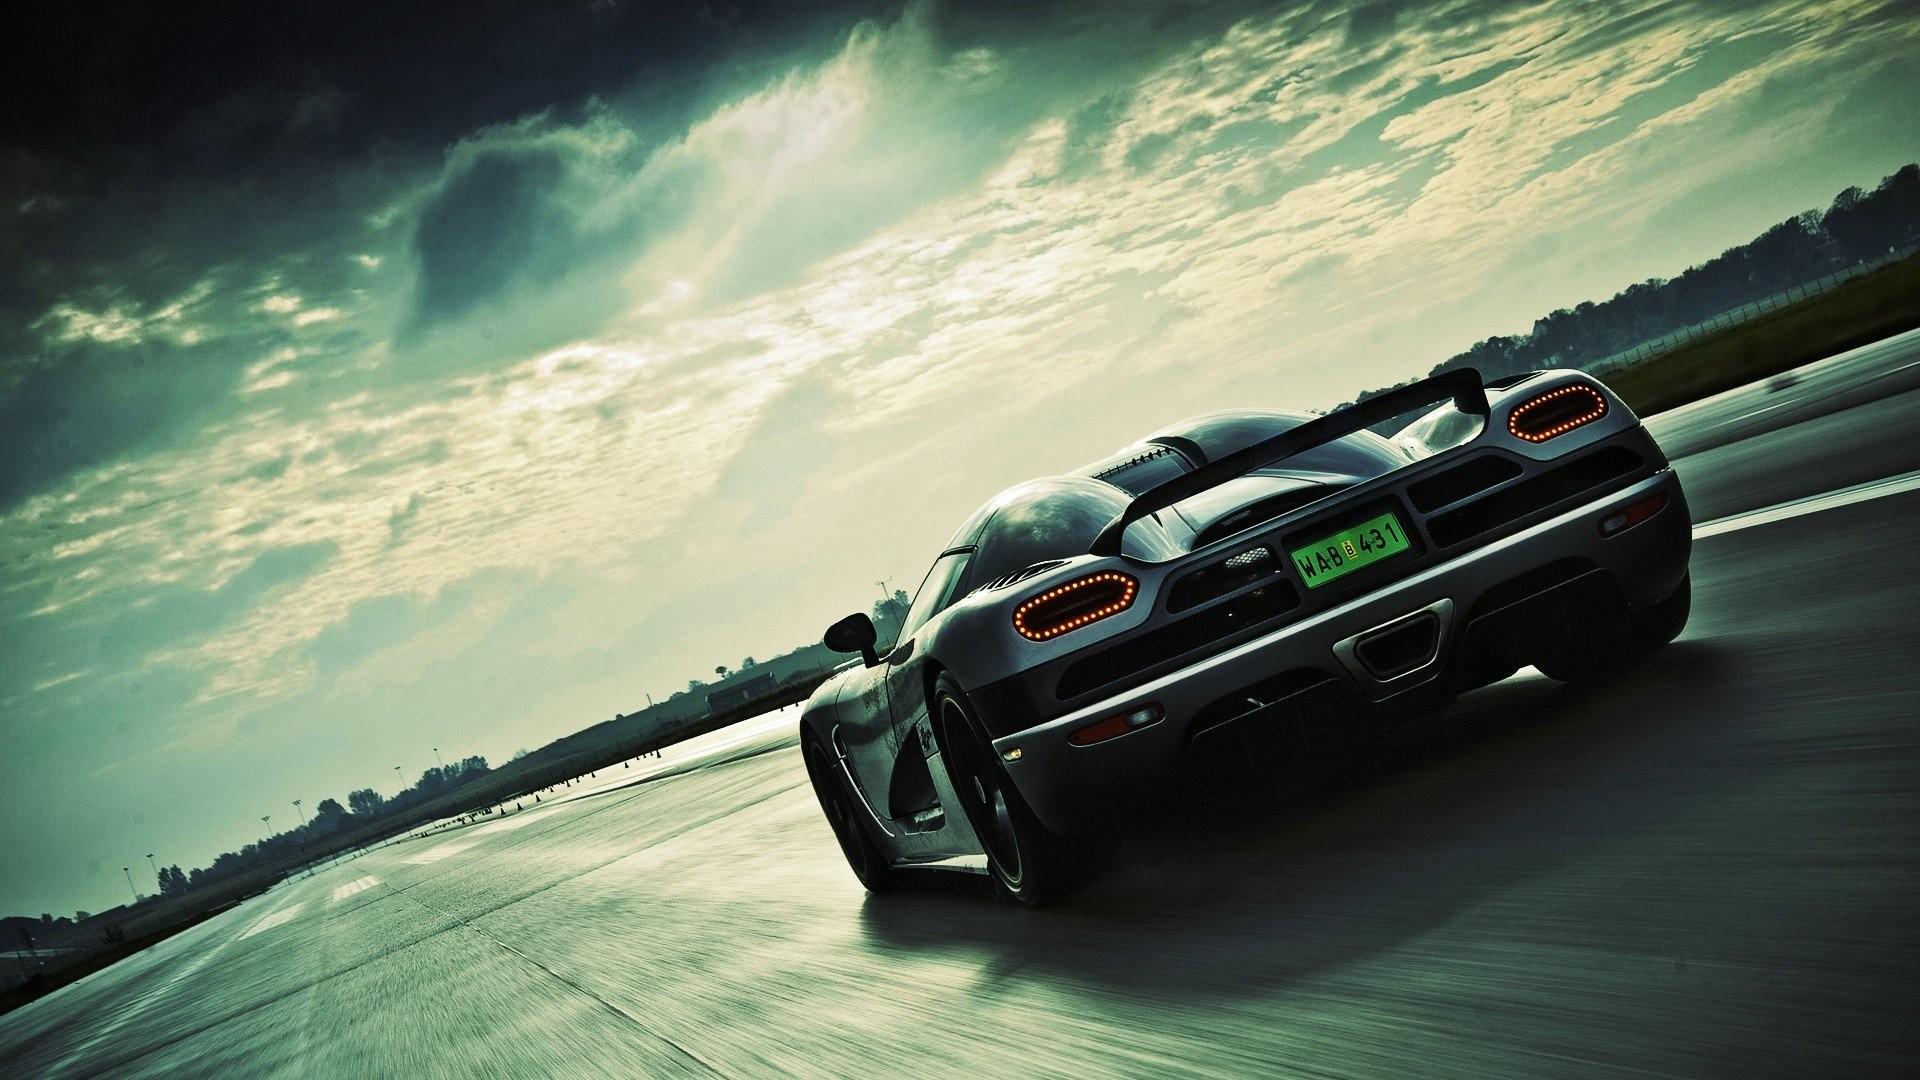 Cars Clouds Koenigsegg Agera R Supercars